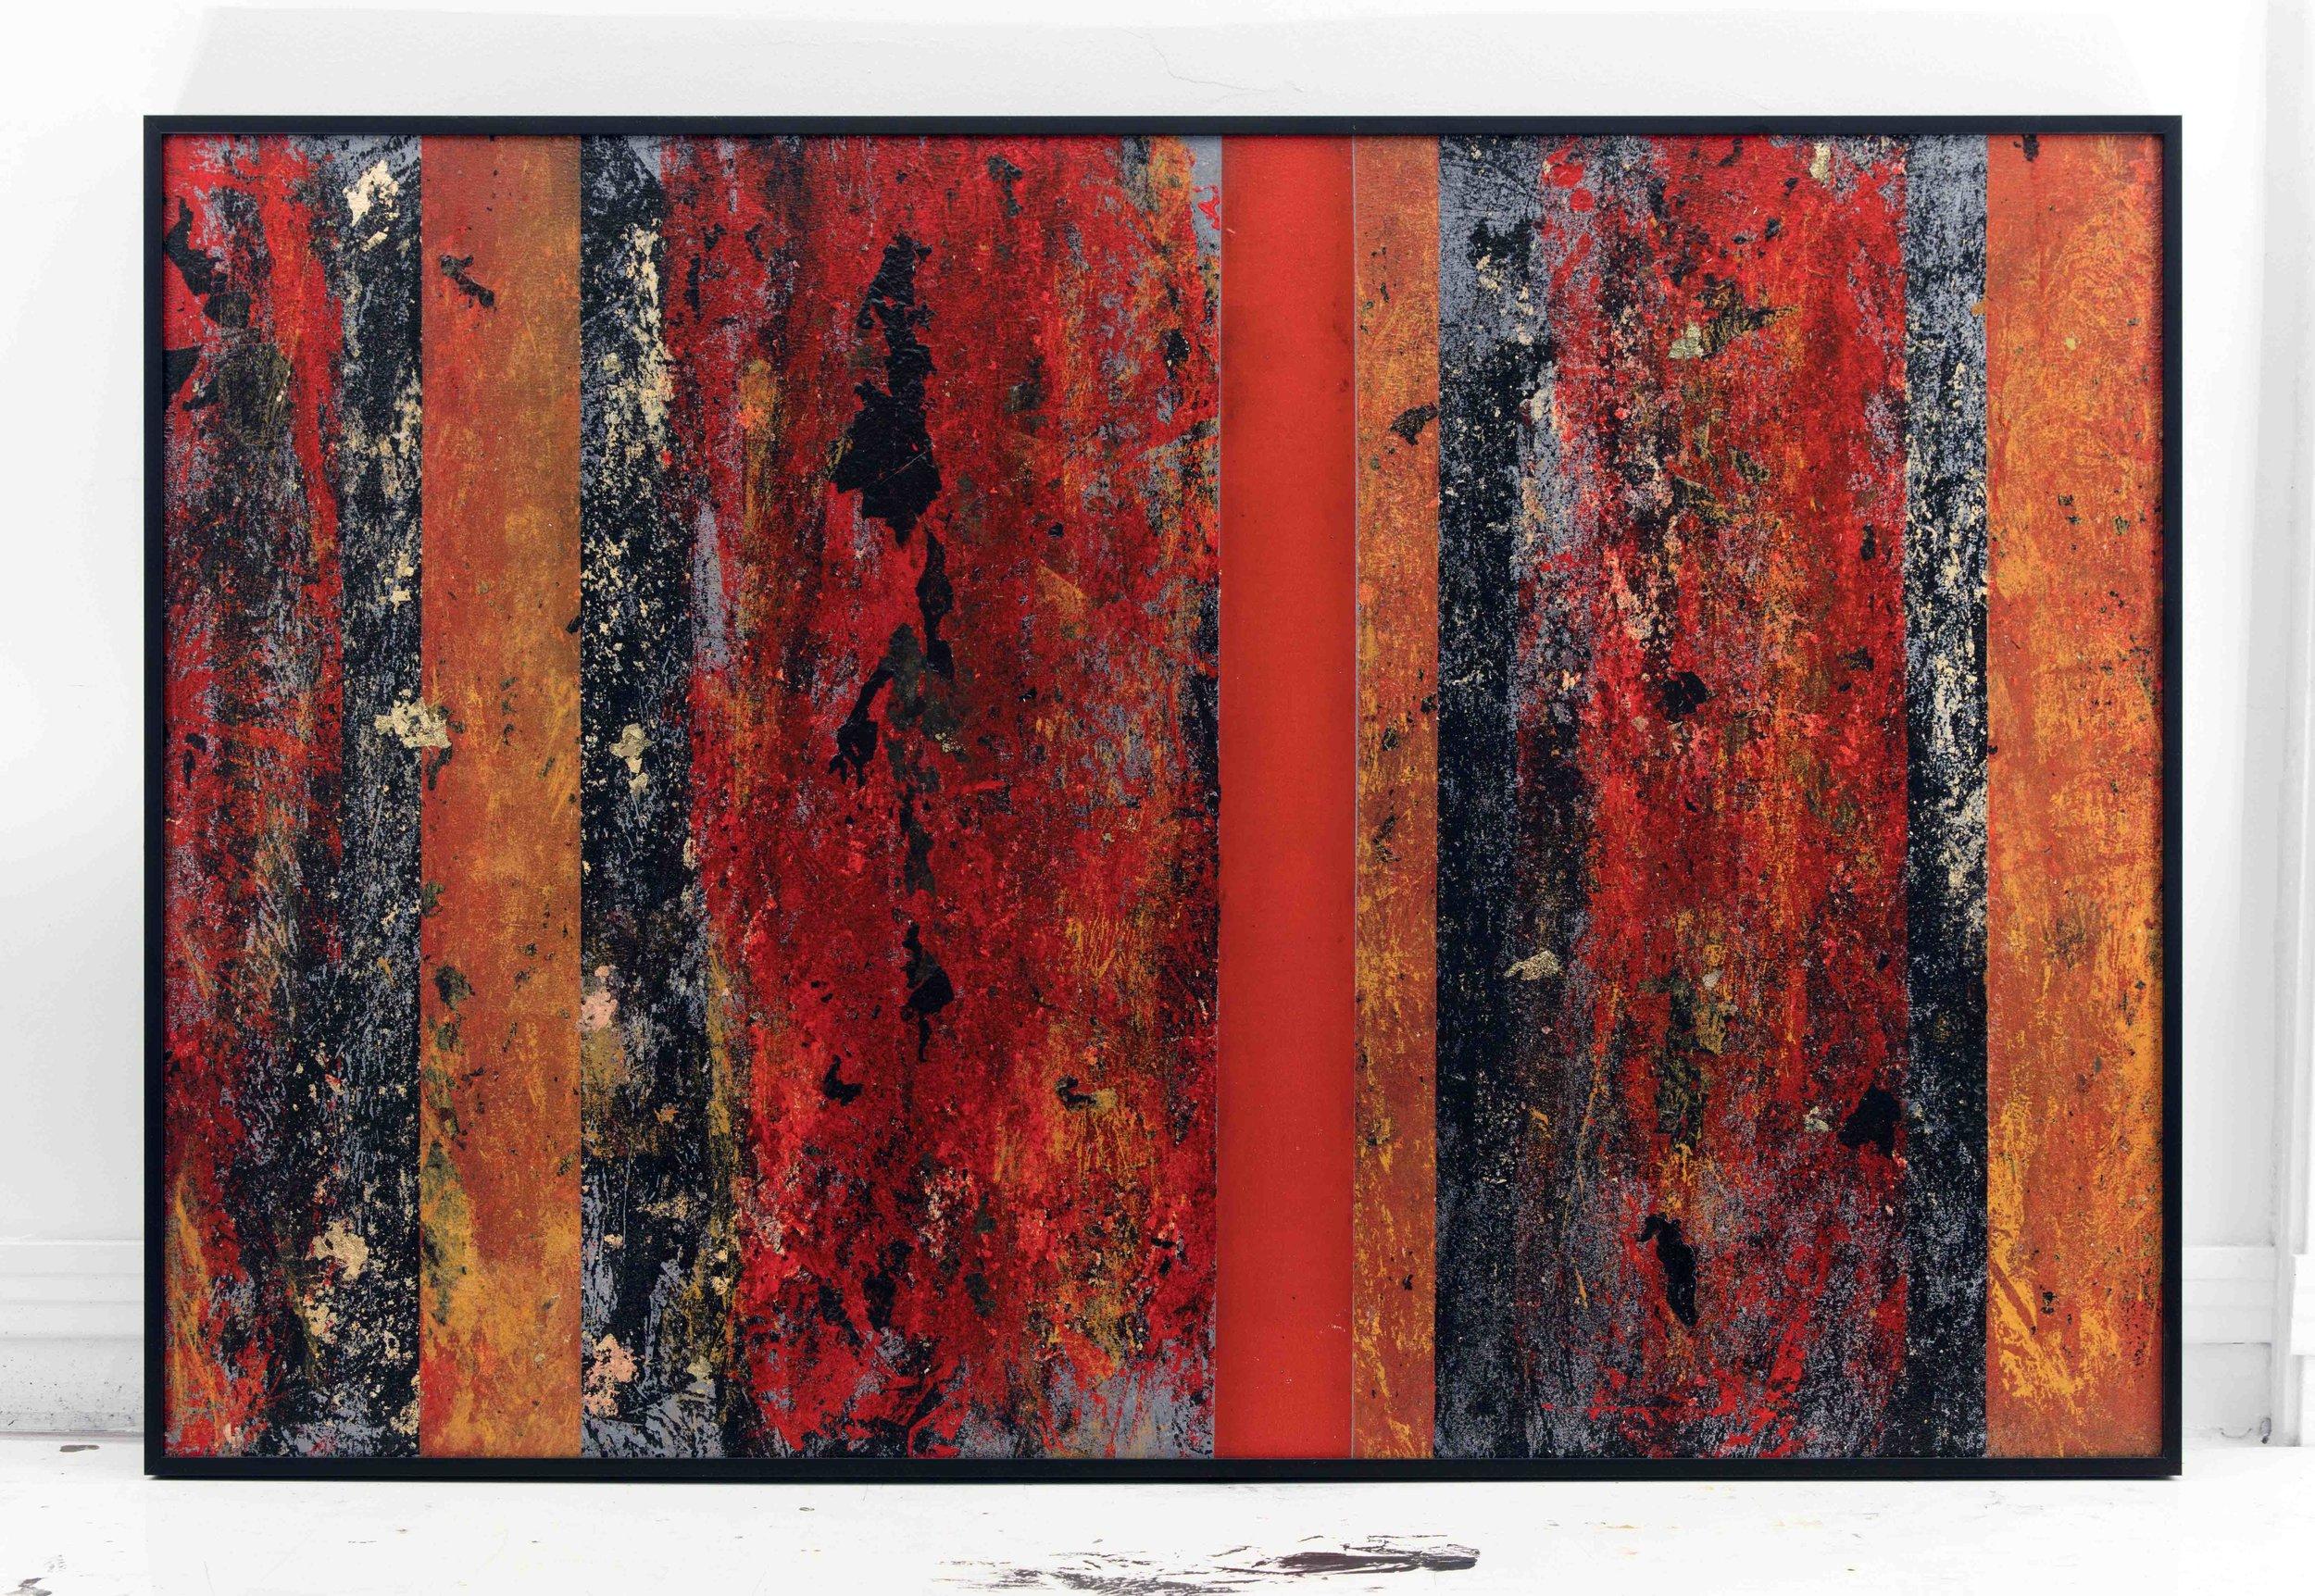 EB-056, Gridlock II, Mixed Media on Panel, 2016, 32 x 48.jpg